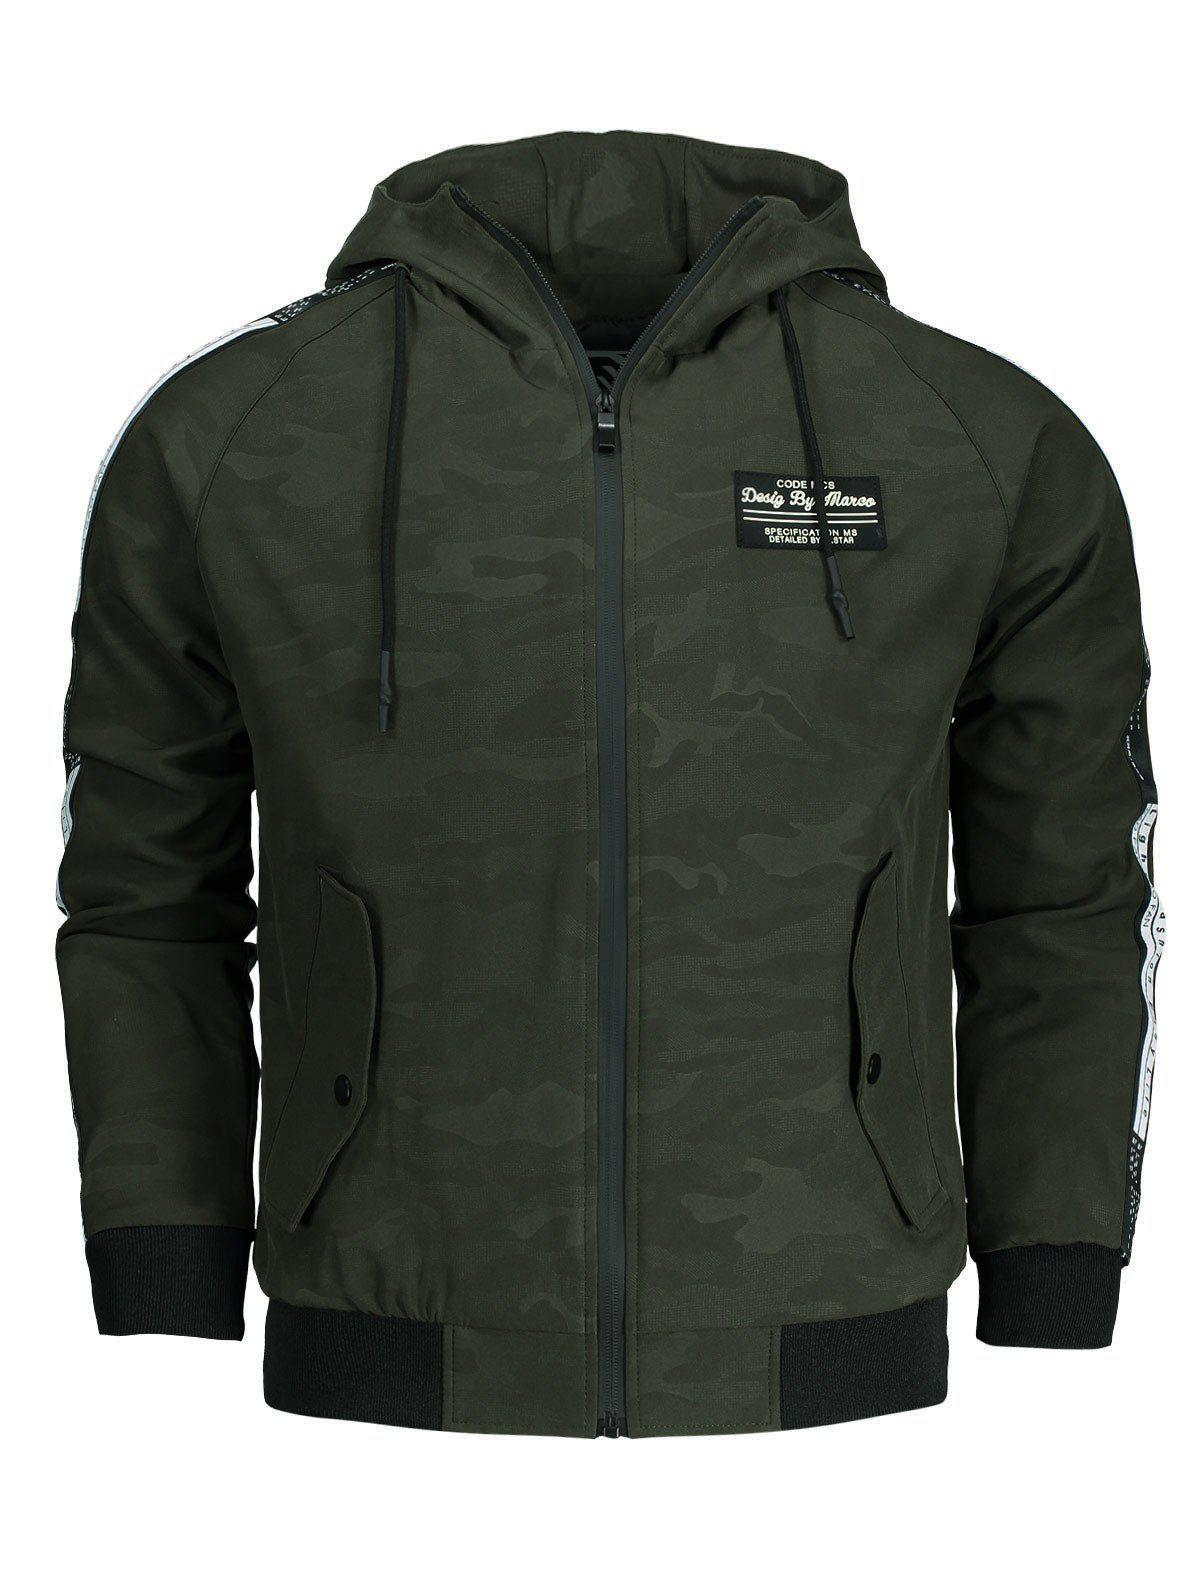 Side Letter Print Camo Hooded Jacket Men Clothes 221805310